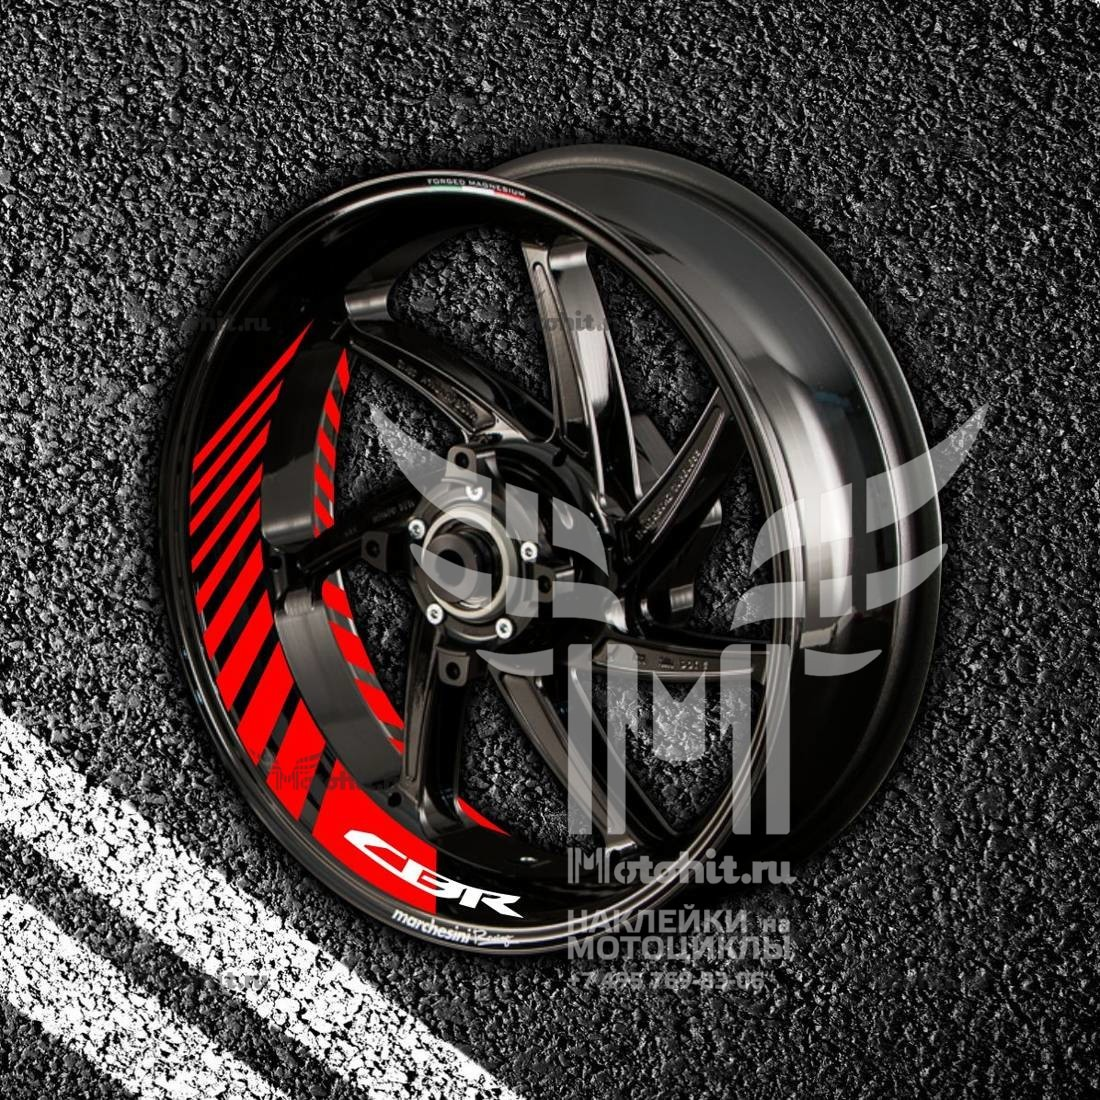 Комплект наклеек с полосами на колеса мотоцикла HONDA CBR